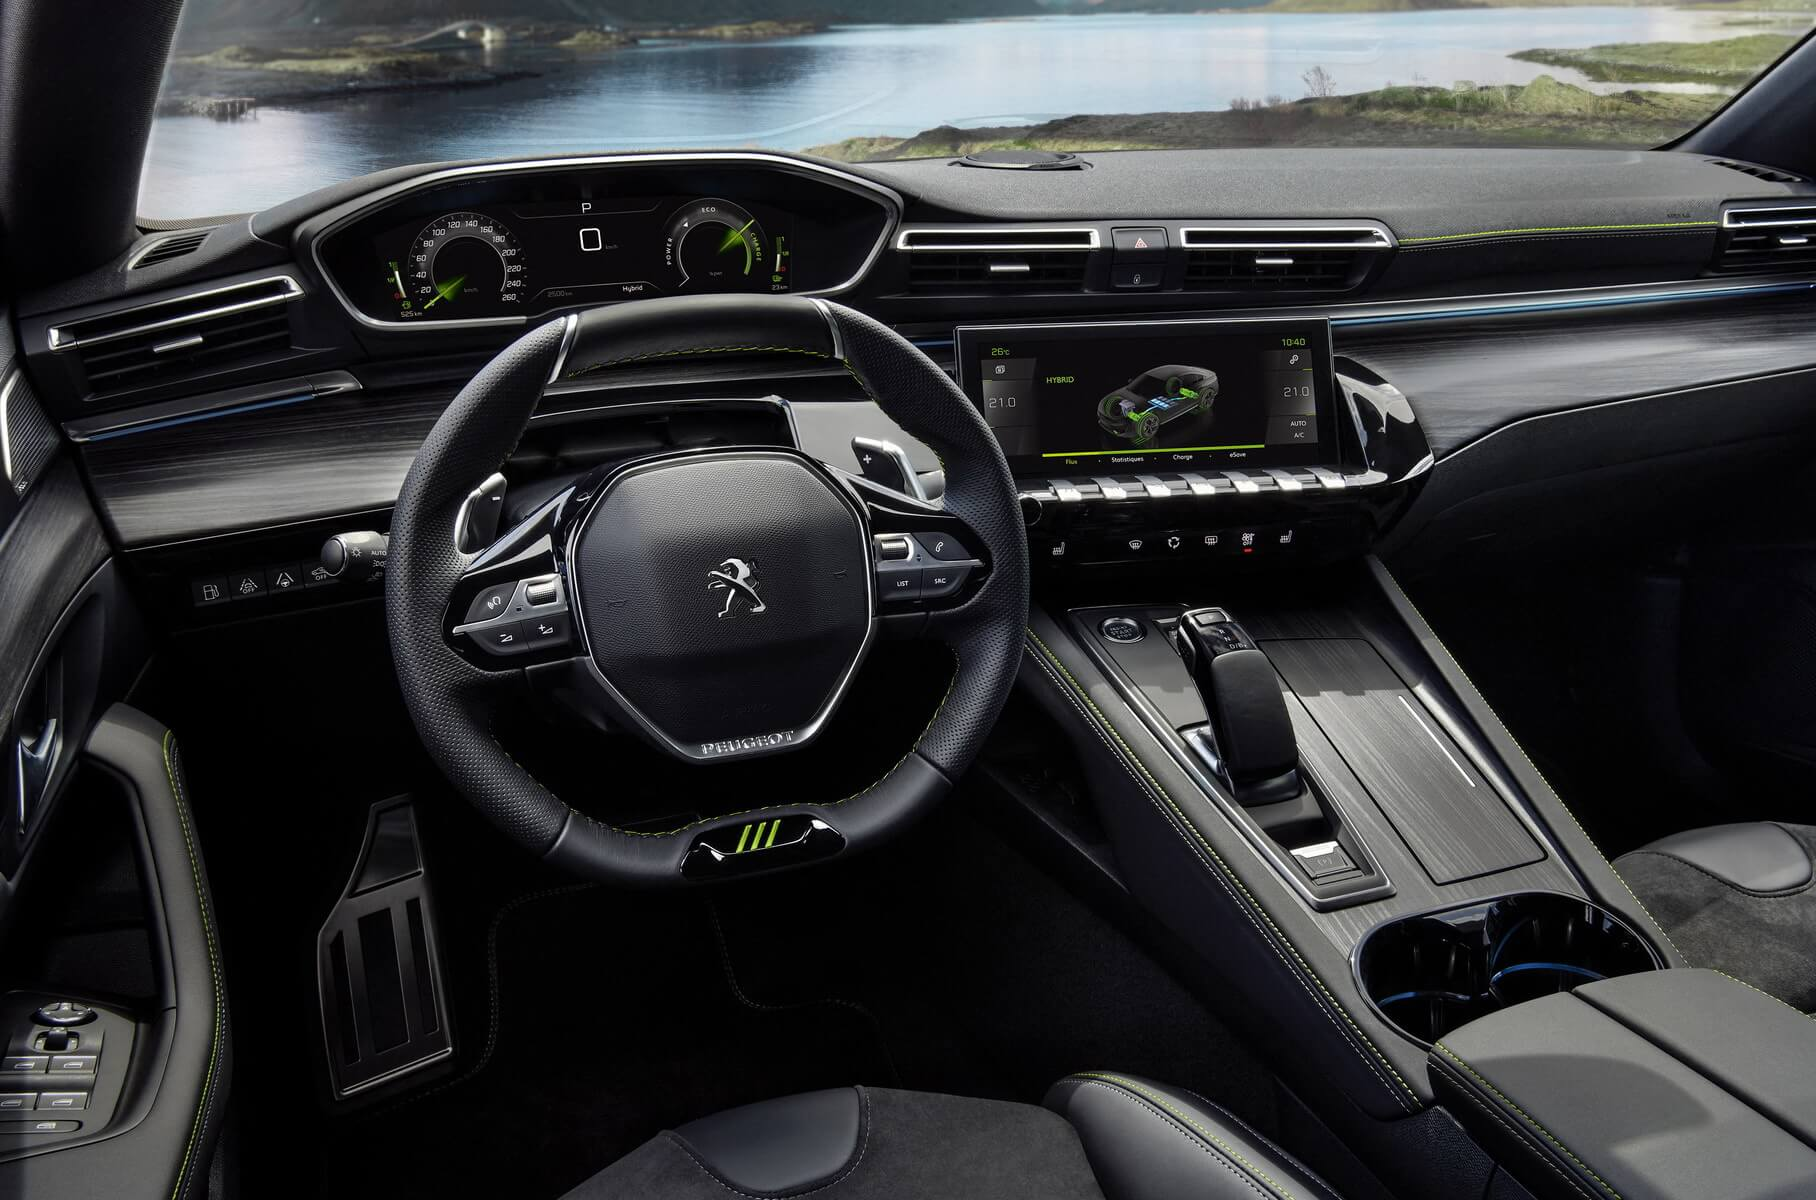 Інтер'єр Peugeot 508 Sport Engineered